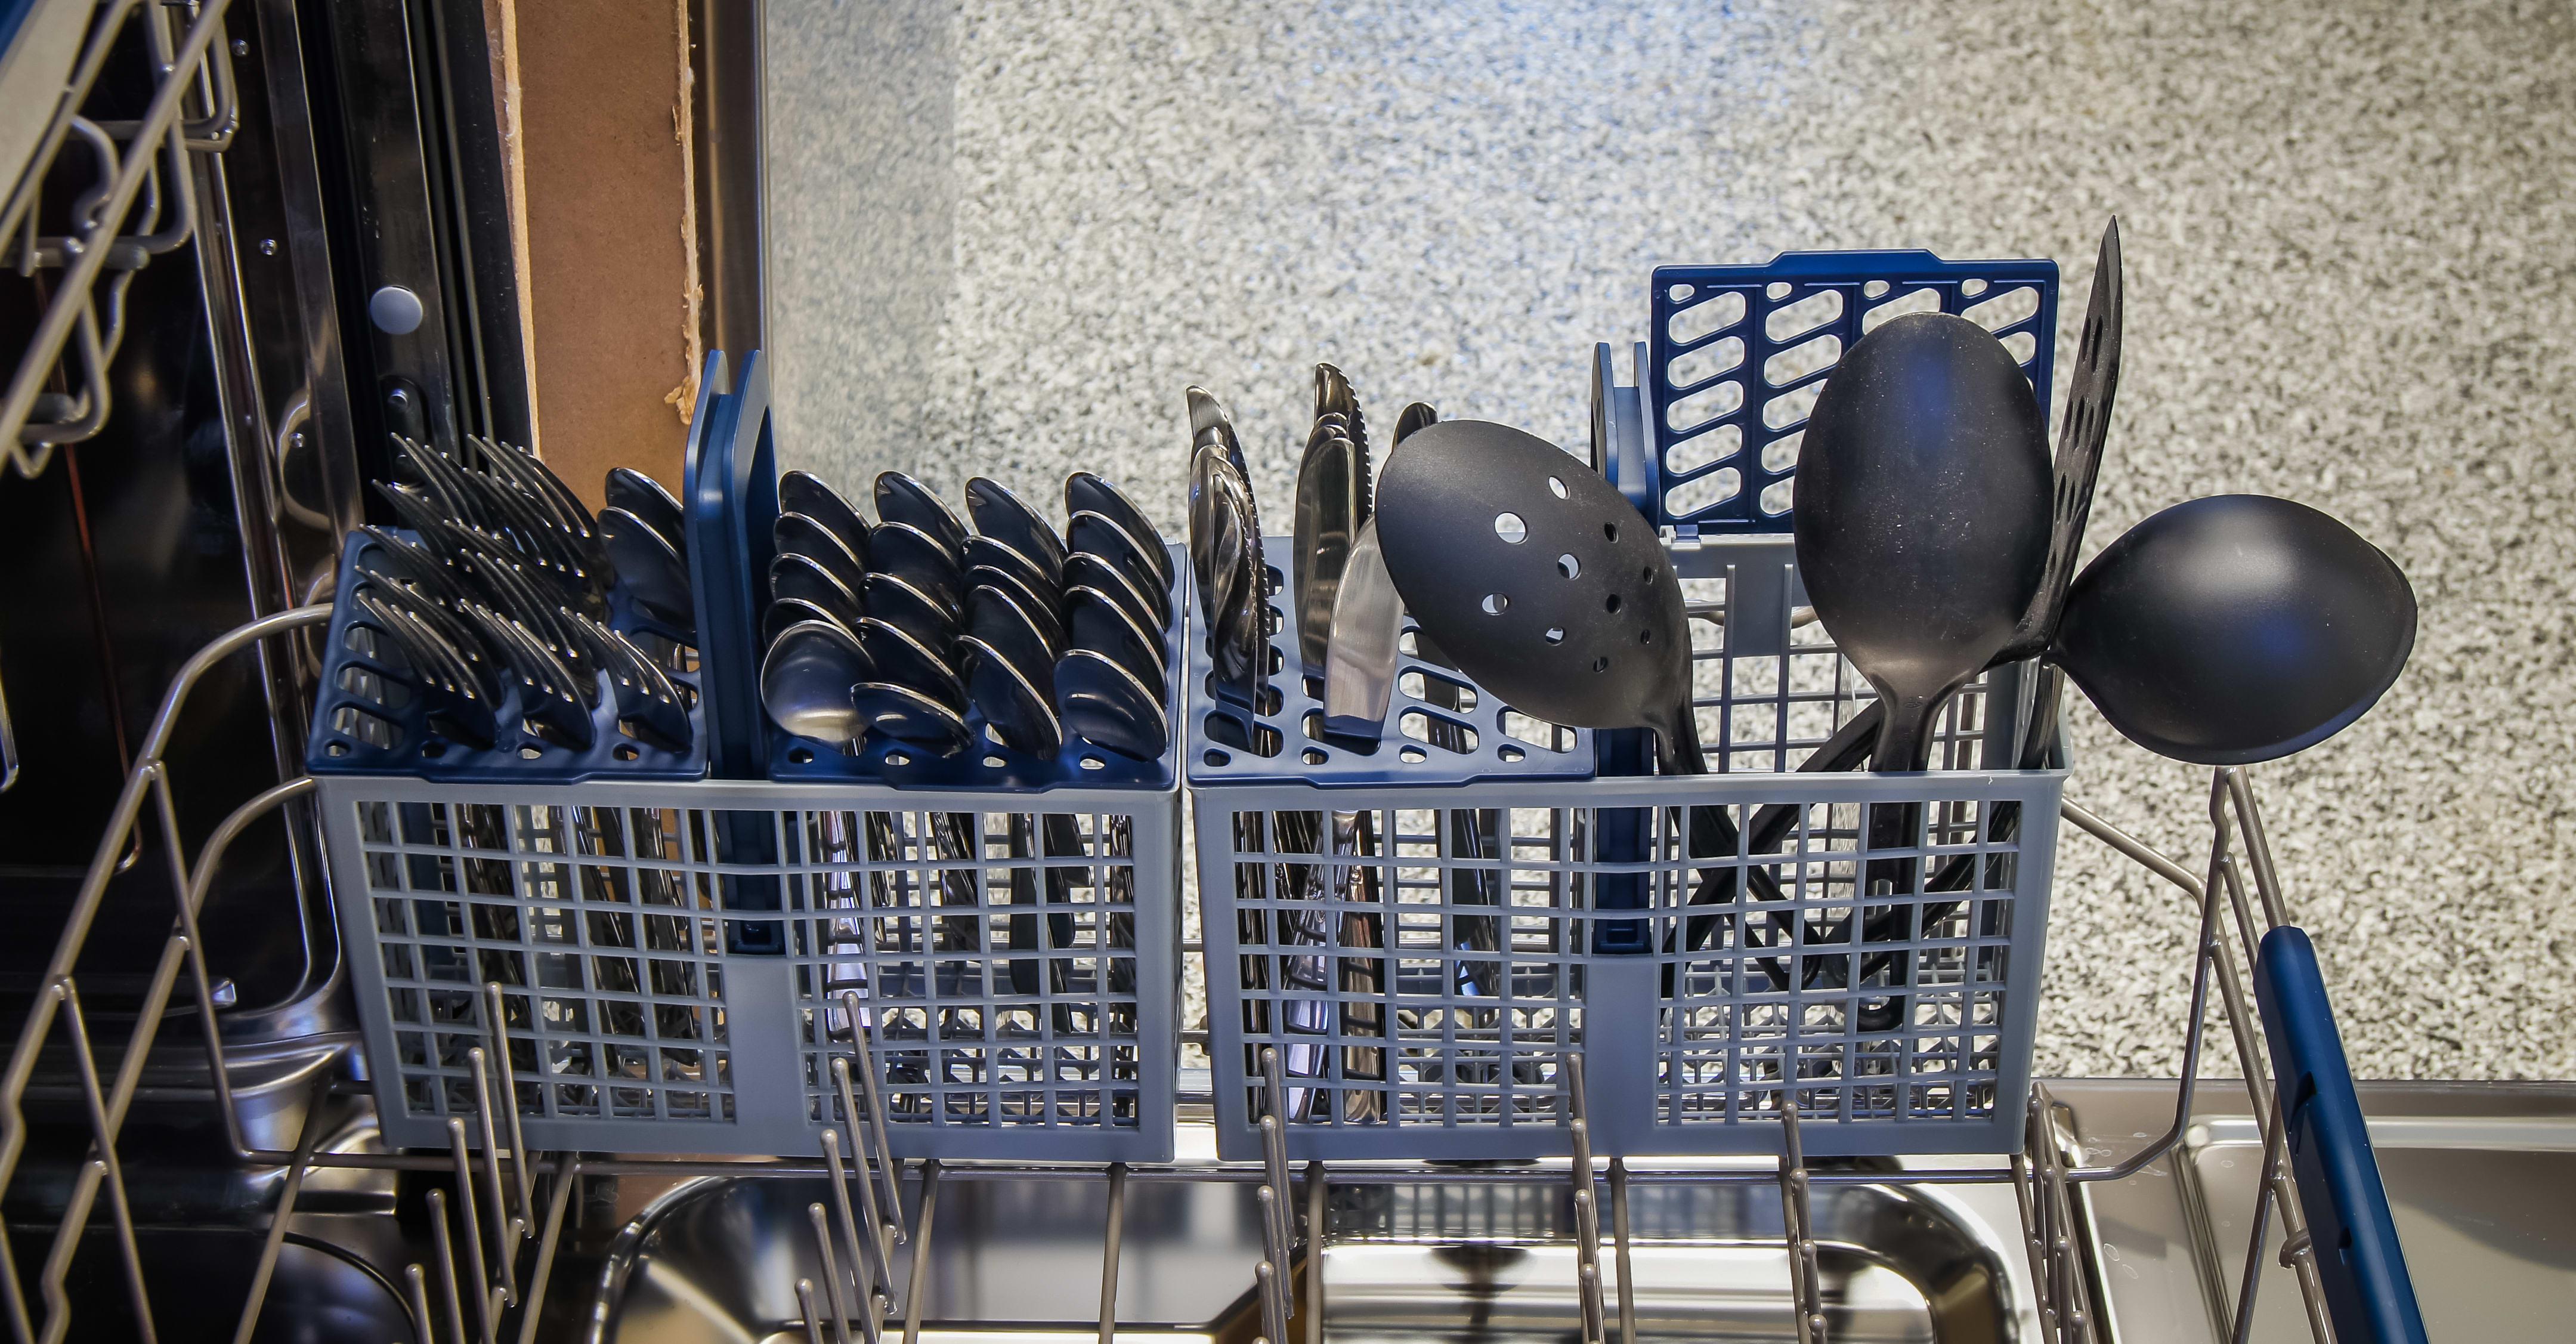 Samsung DW80H9930US cutlery basket capacity